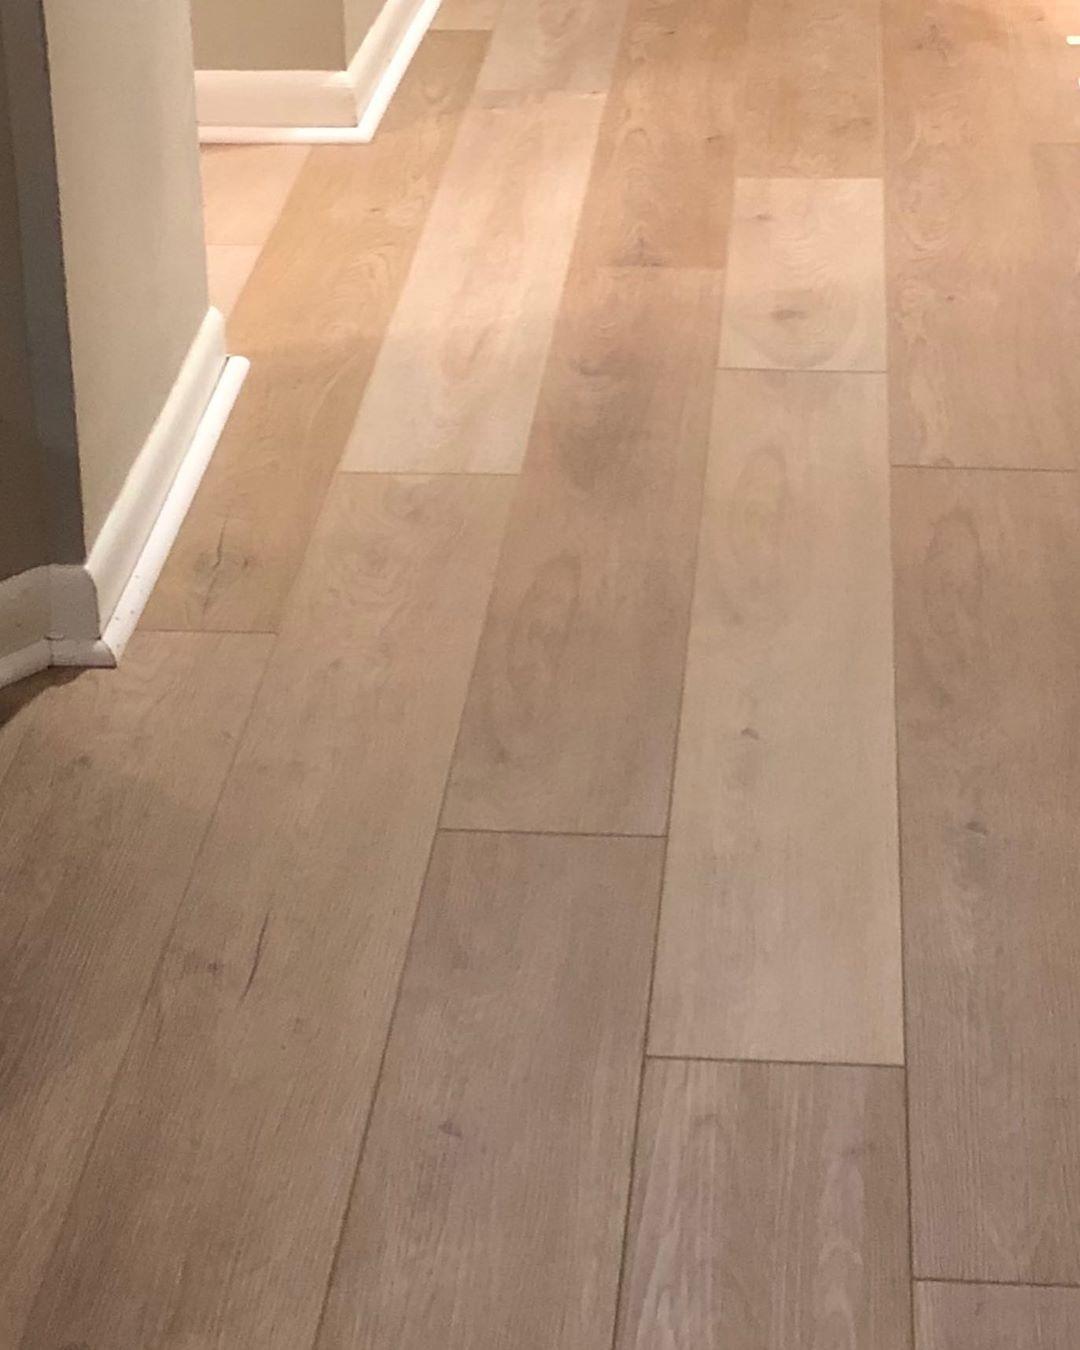 Flooring Sweet Talker Hardwood Floors, Provenza Laminate Flooring Reviews